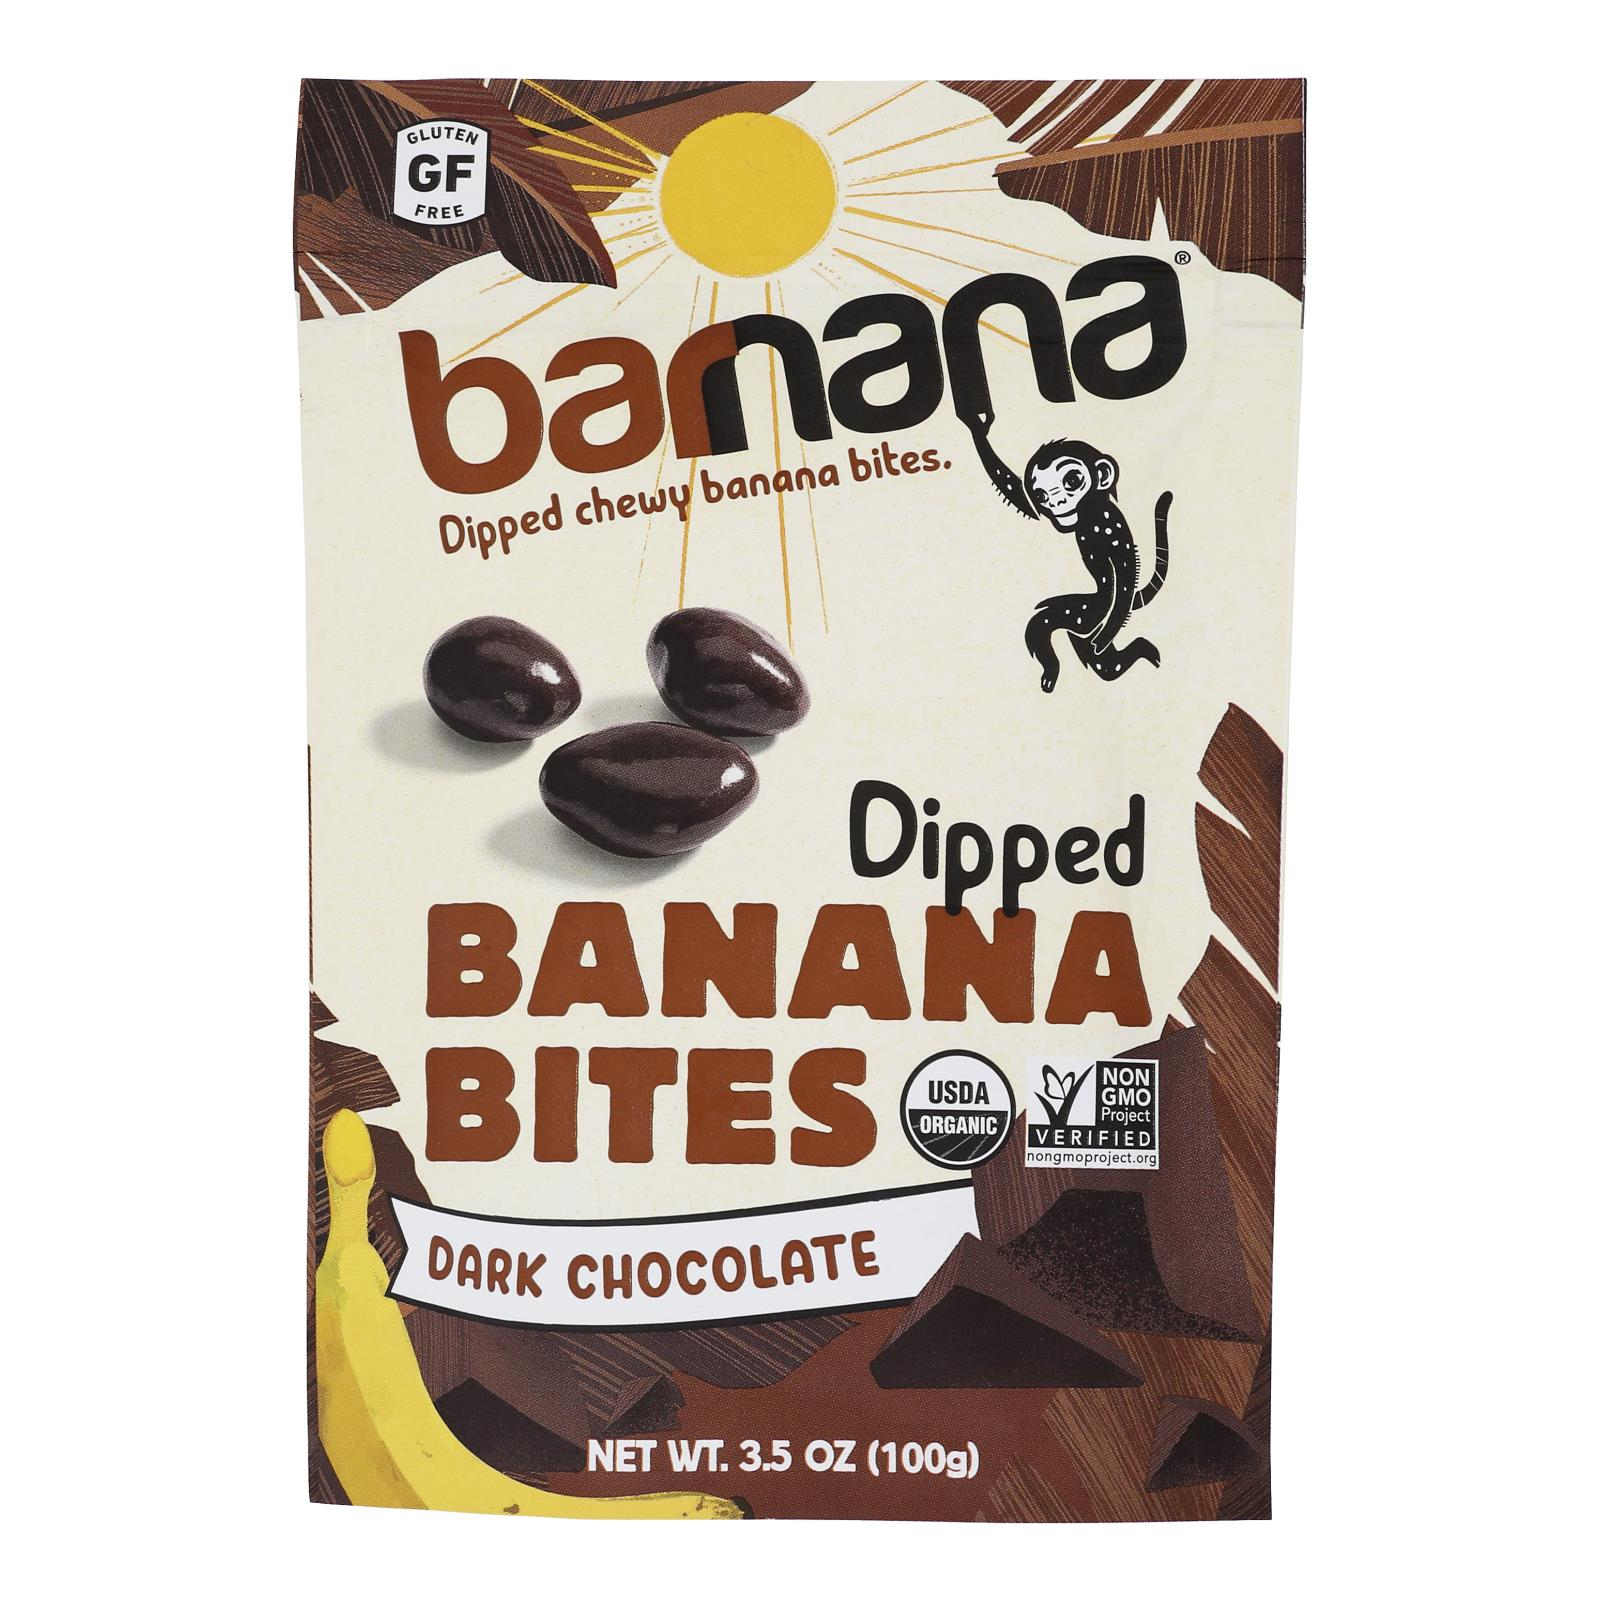 Barnana Chewy Banana Bites - Organic Chocolate - Case of 12 - 3.5 oz.